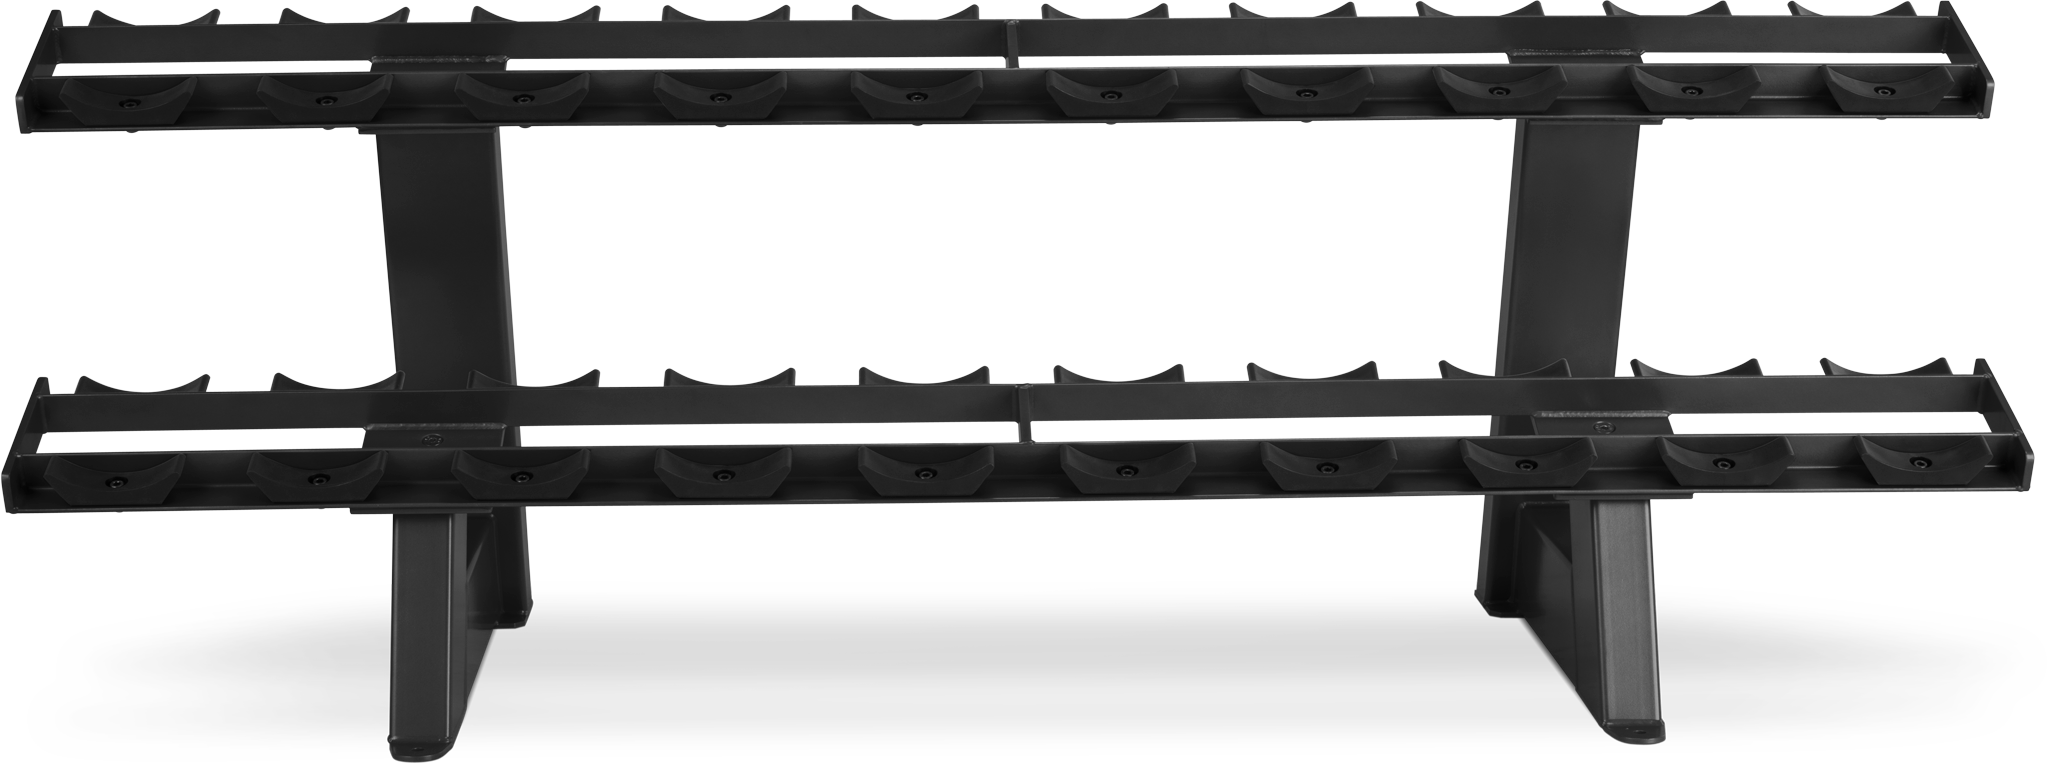 EF209 STUDIO Black 0244